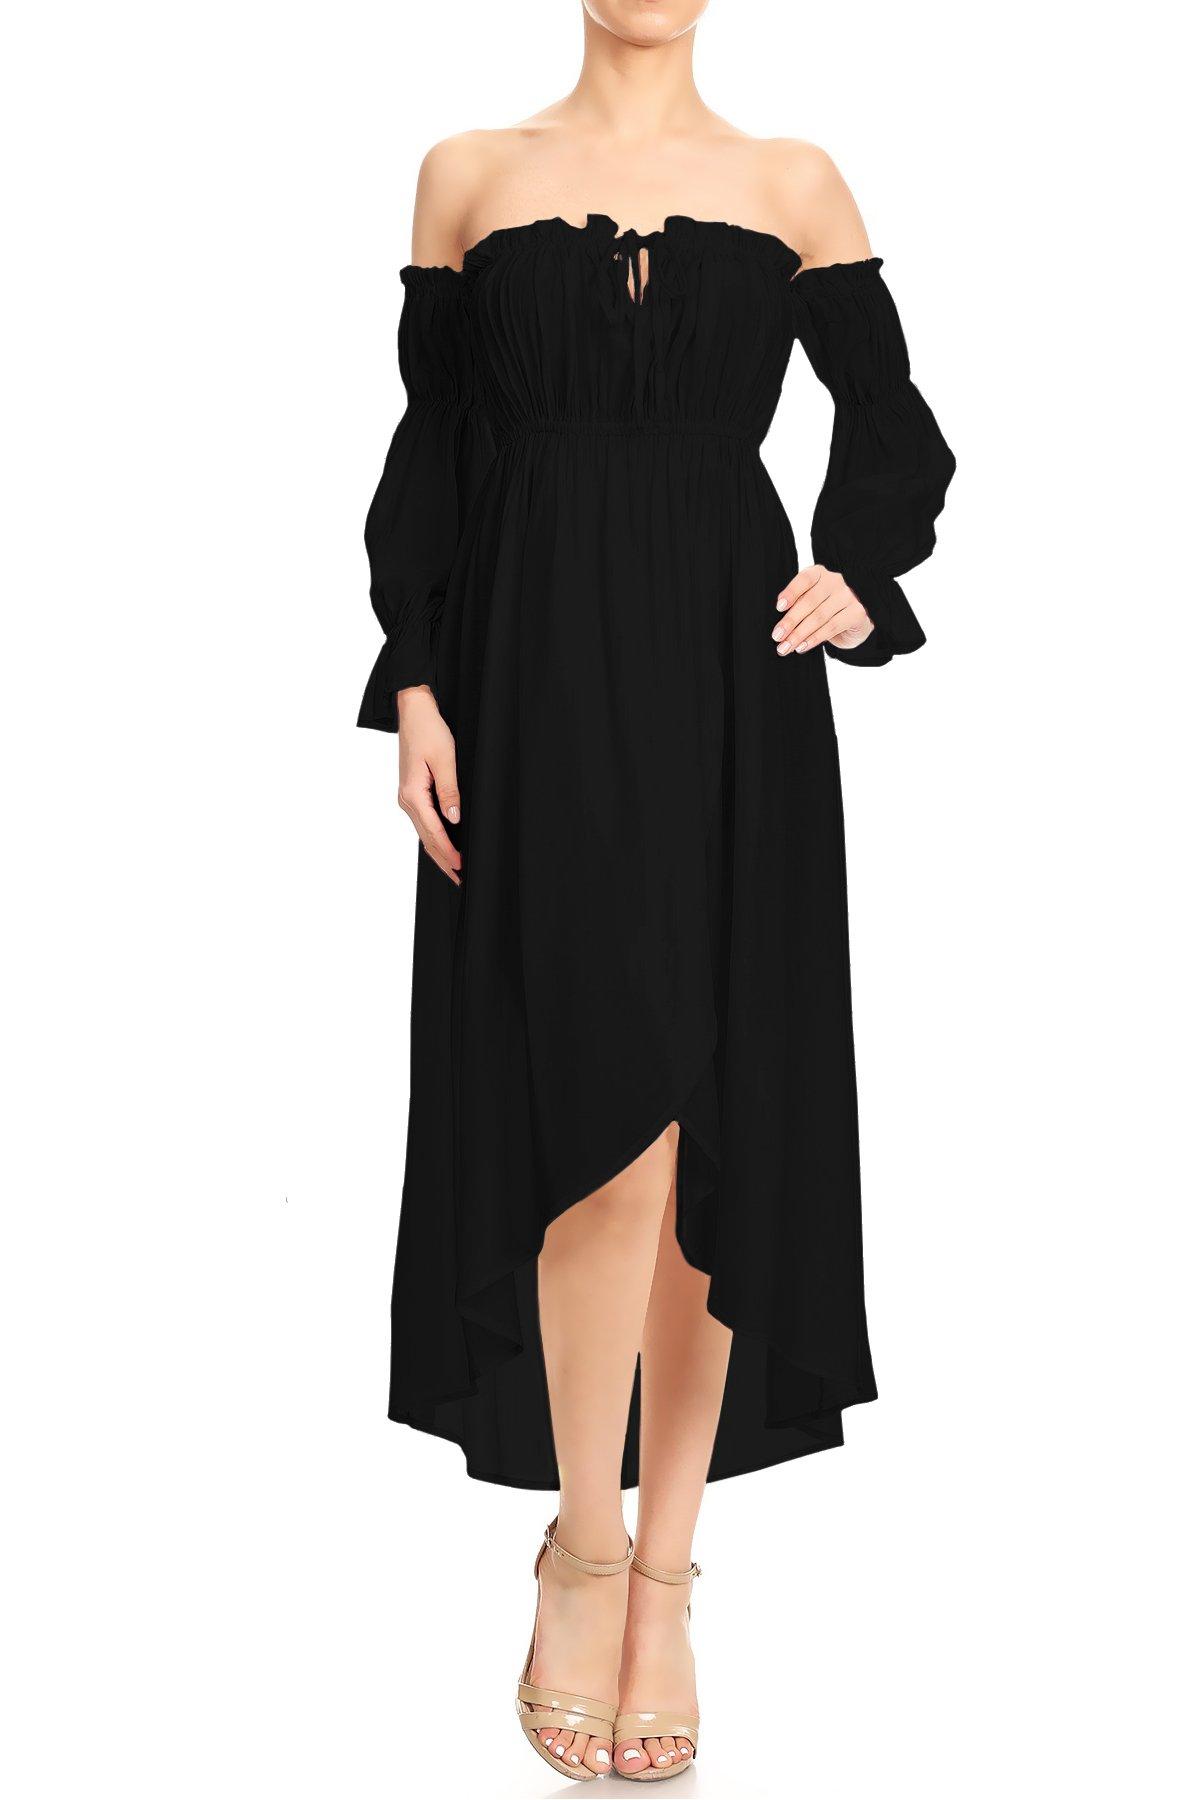 ANNA-KACI Womens Casual Boho Long Sleeve Off Shoulder Renaissance Peasant Dress 3